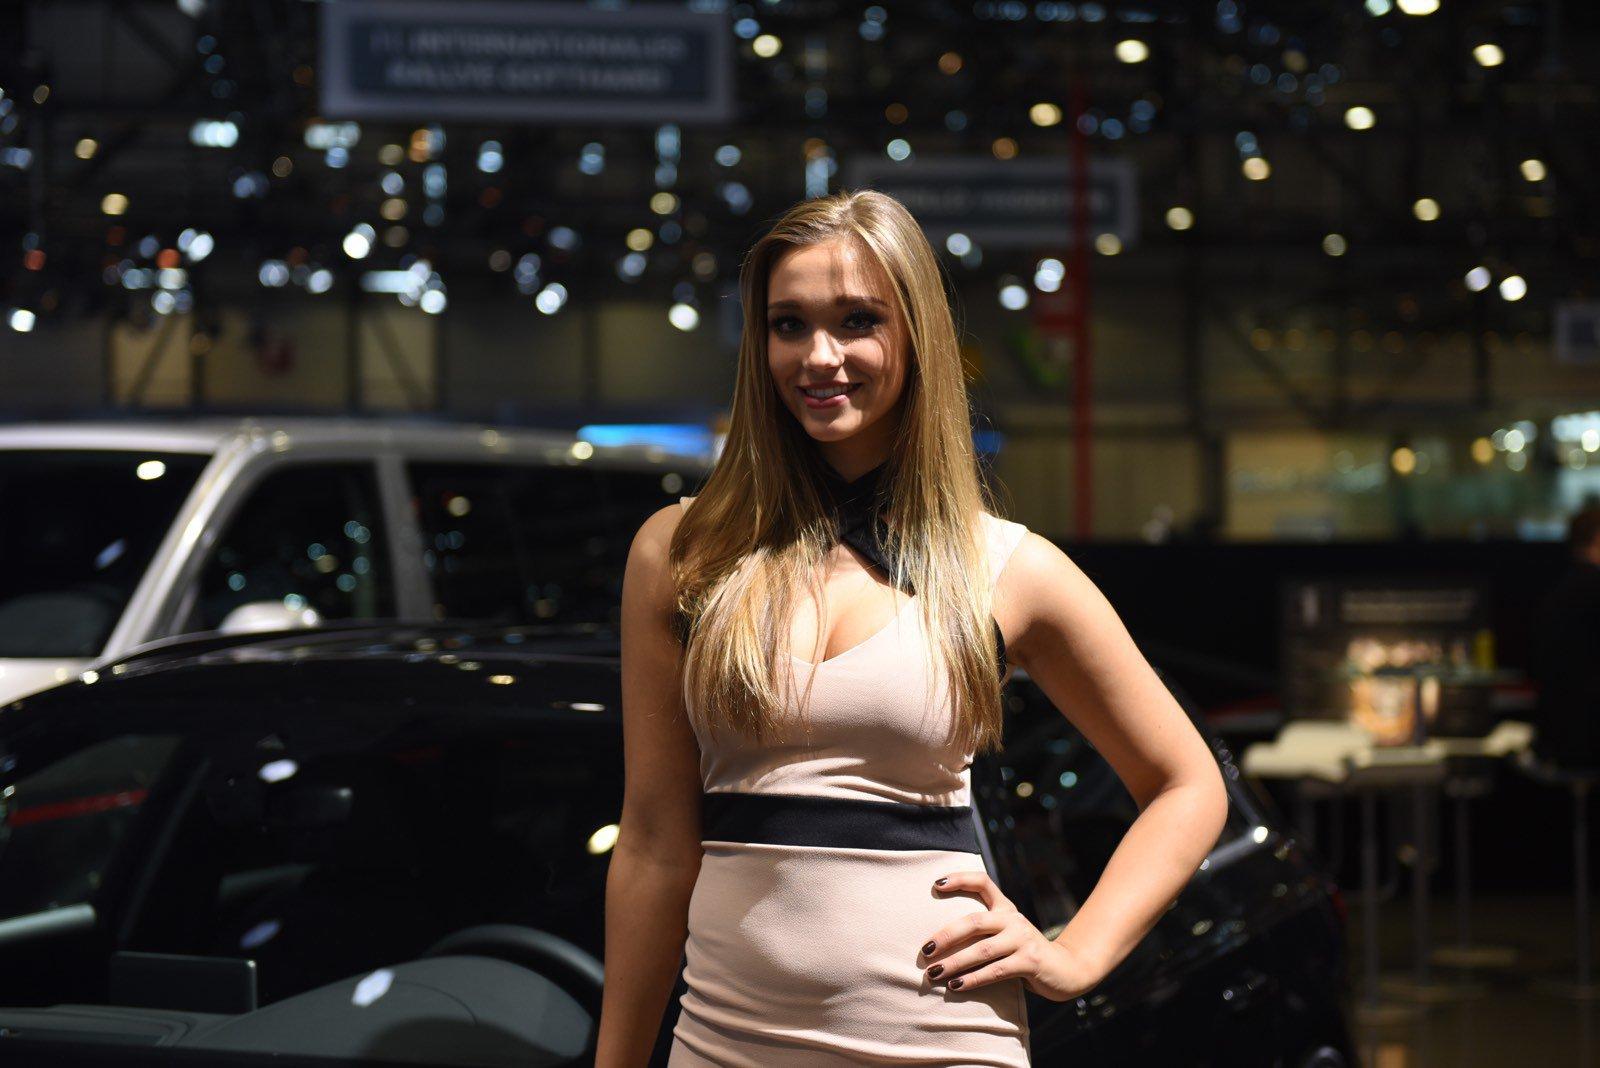 Motor Show Girls 6 Λαμπρές πρεμιέρες στην έκθεση αυτοκινήτου το Σάββατο 22 Οκτωβρίου autoshow, Αυτοκίνηση, ΑΥΤΟΚΙΝΗΣΗ 2016, ΦΙΛΠΑ